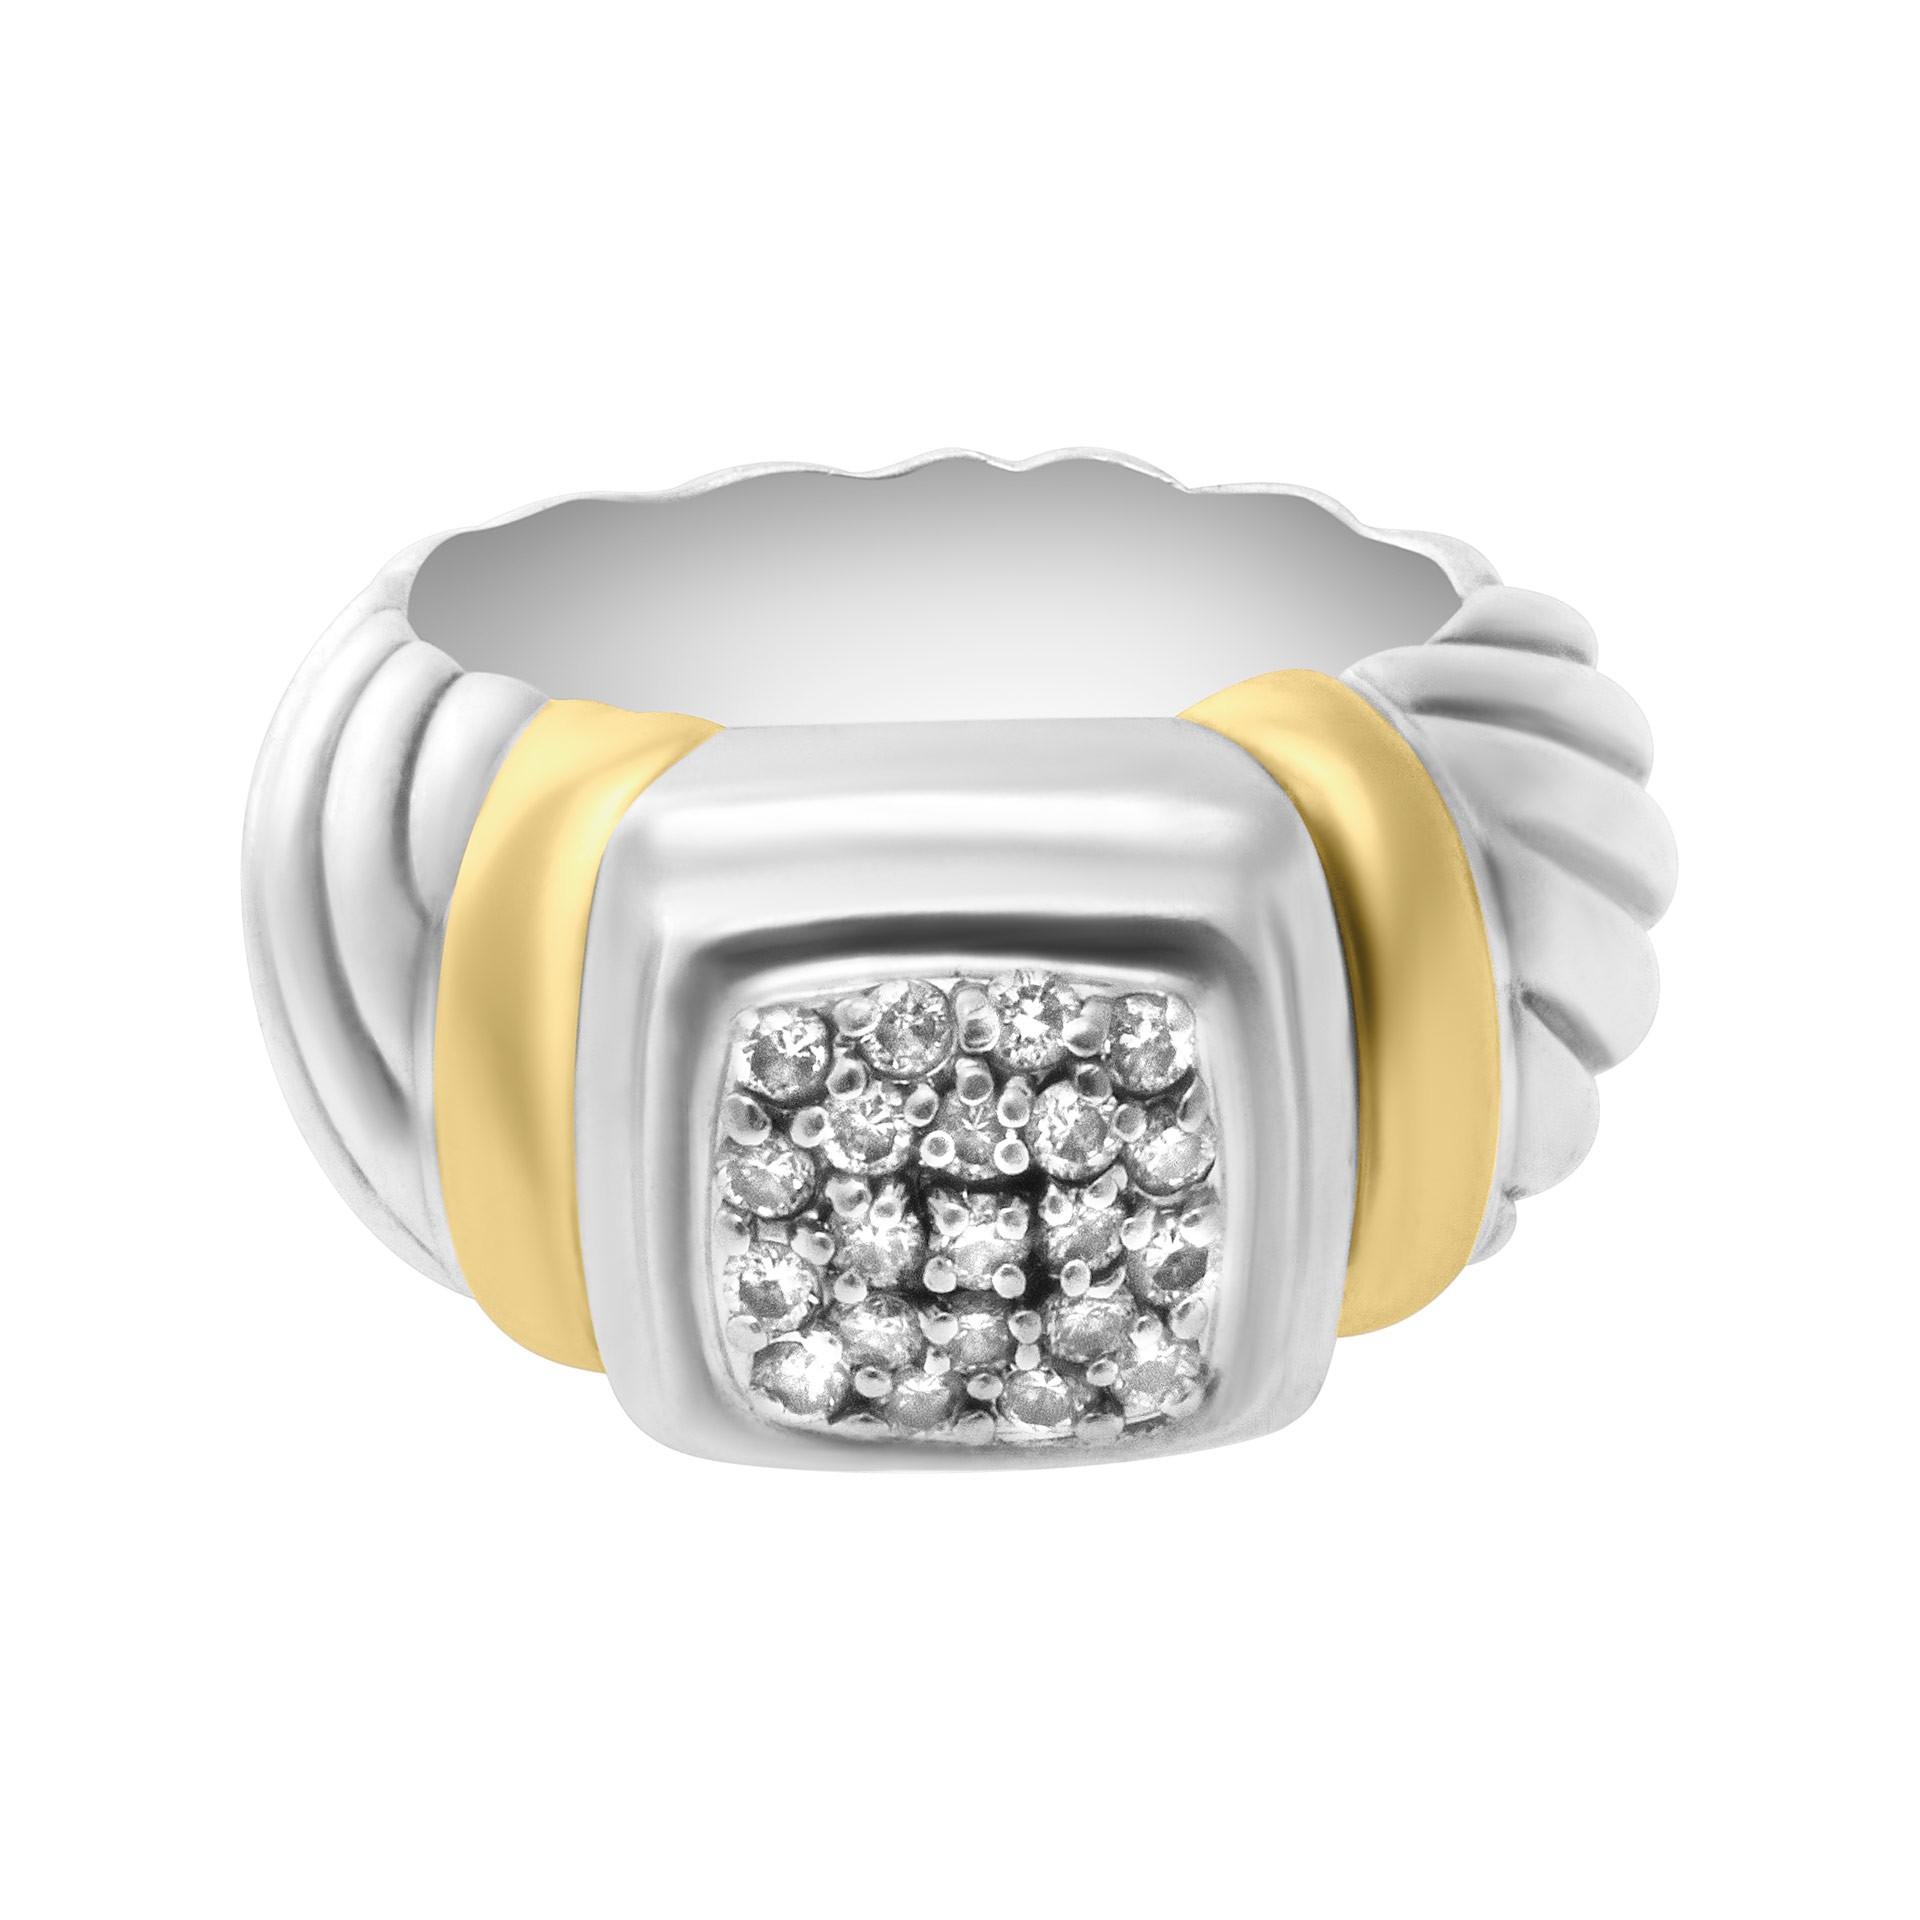 s515469 david yurman ring in 18k sterling silver with